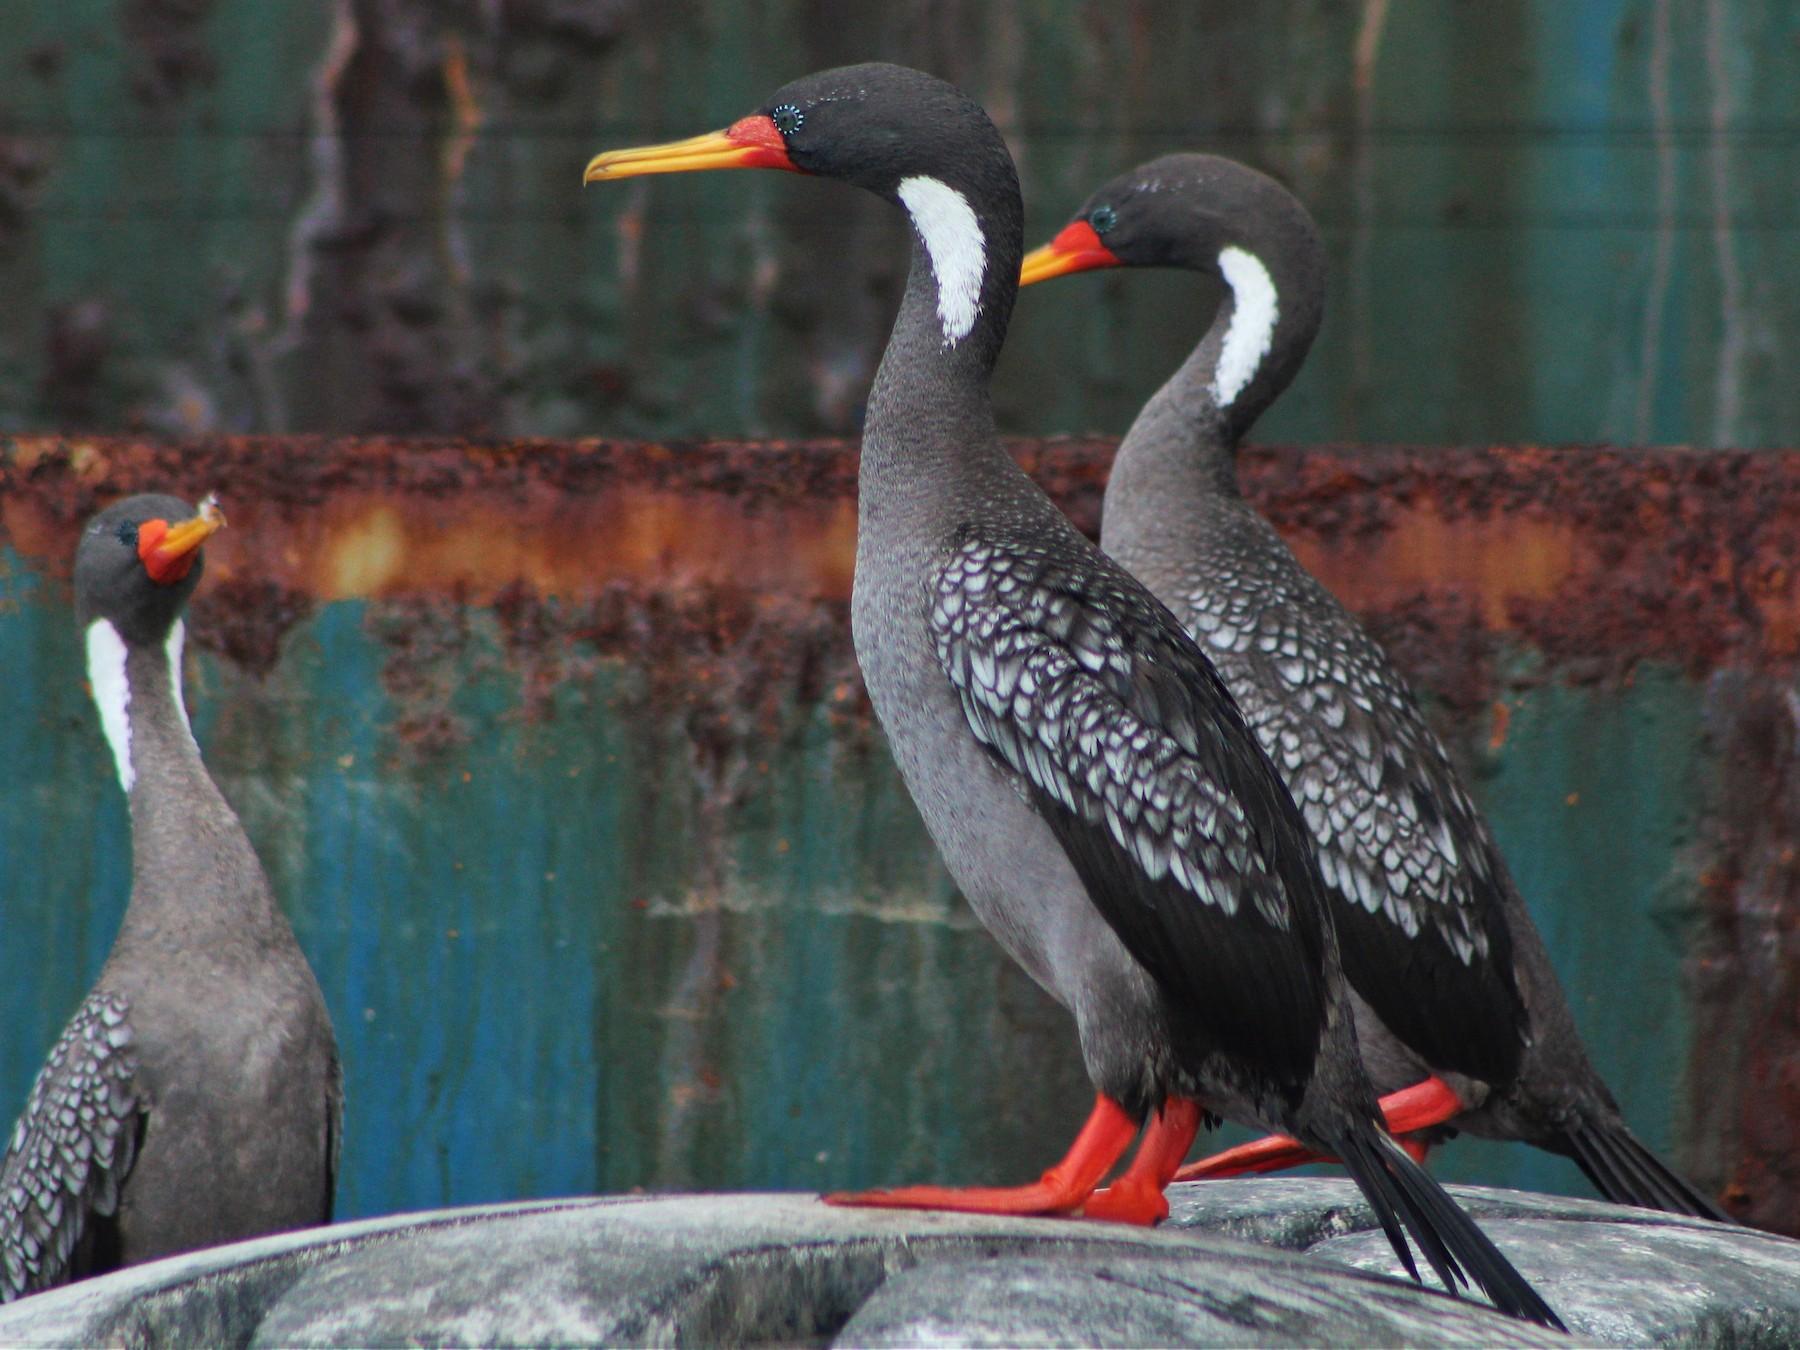 Red-legged Cormorant - Matías Garrido